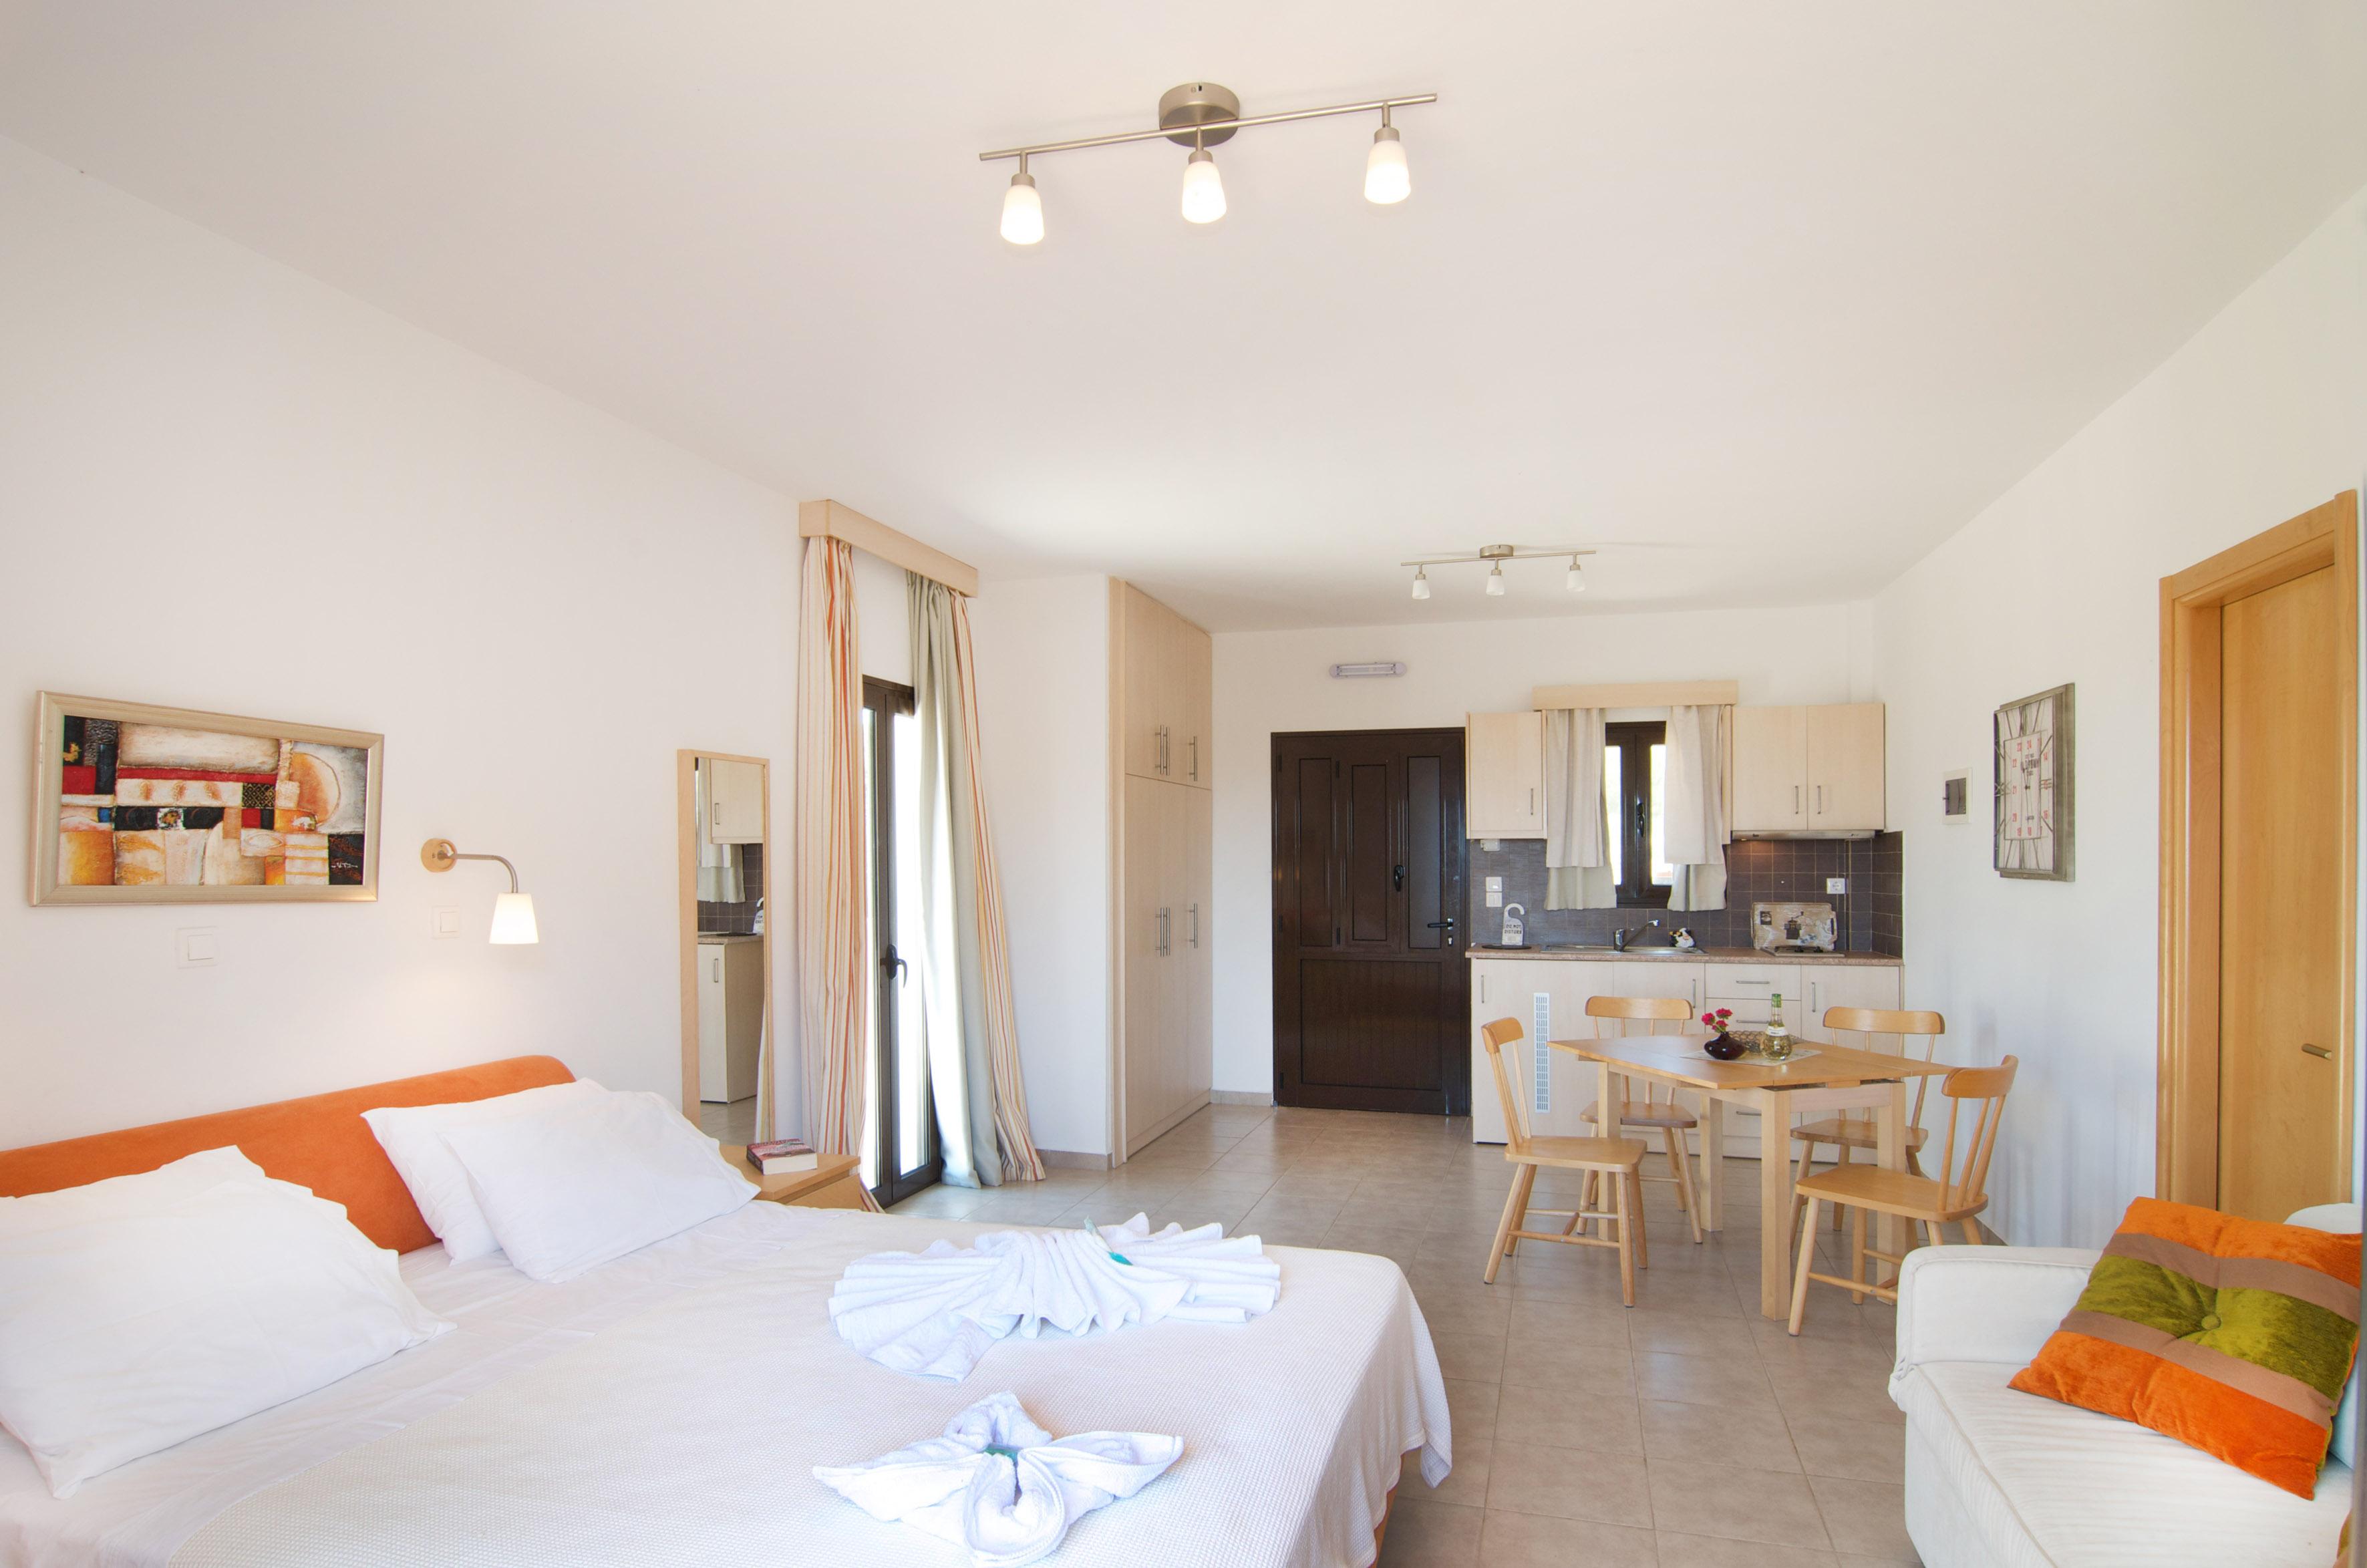 Cassettiera Stretta E Lunga studios - miraluna hotel